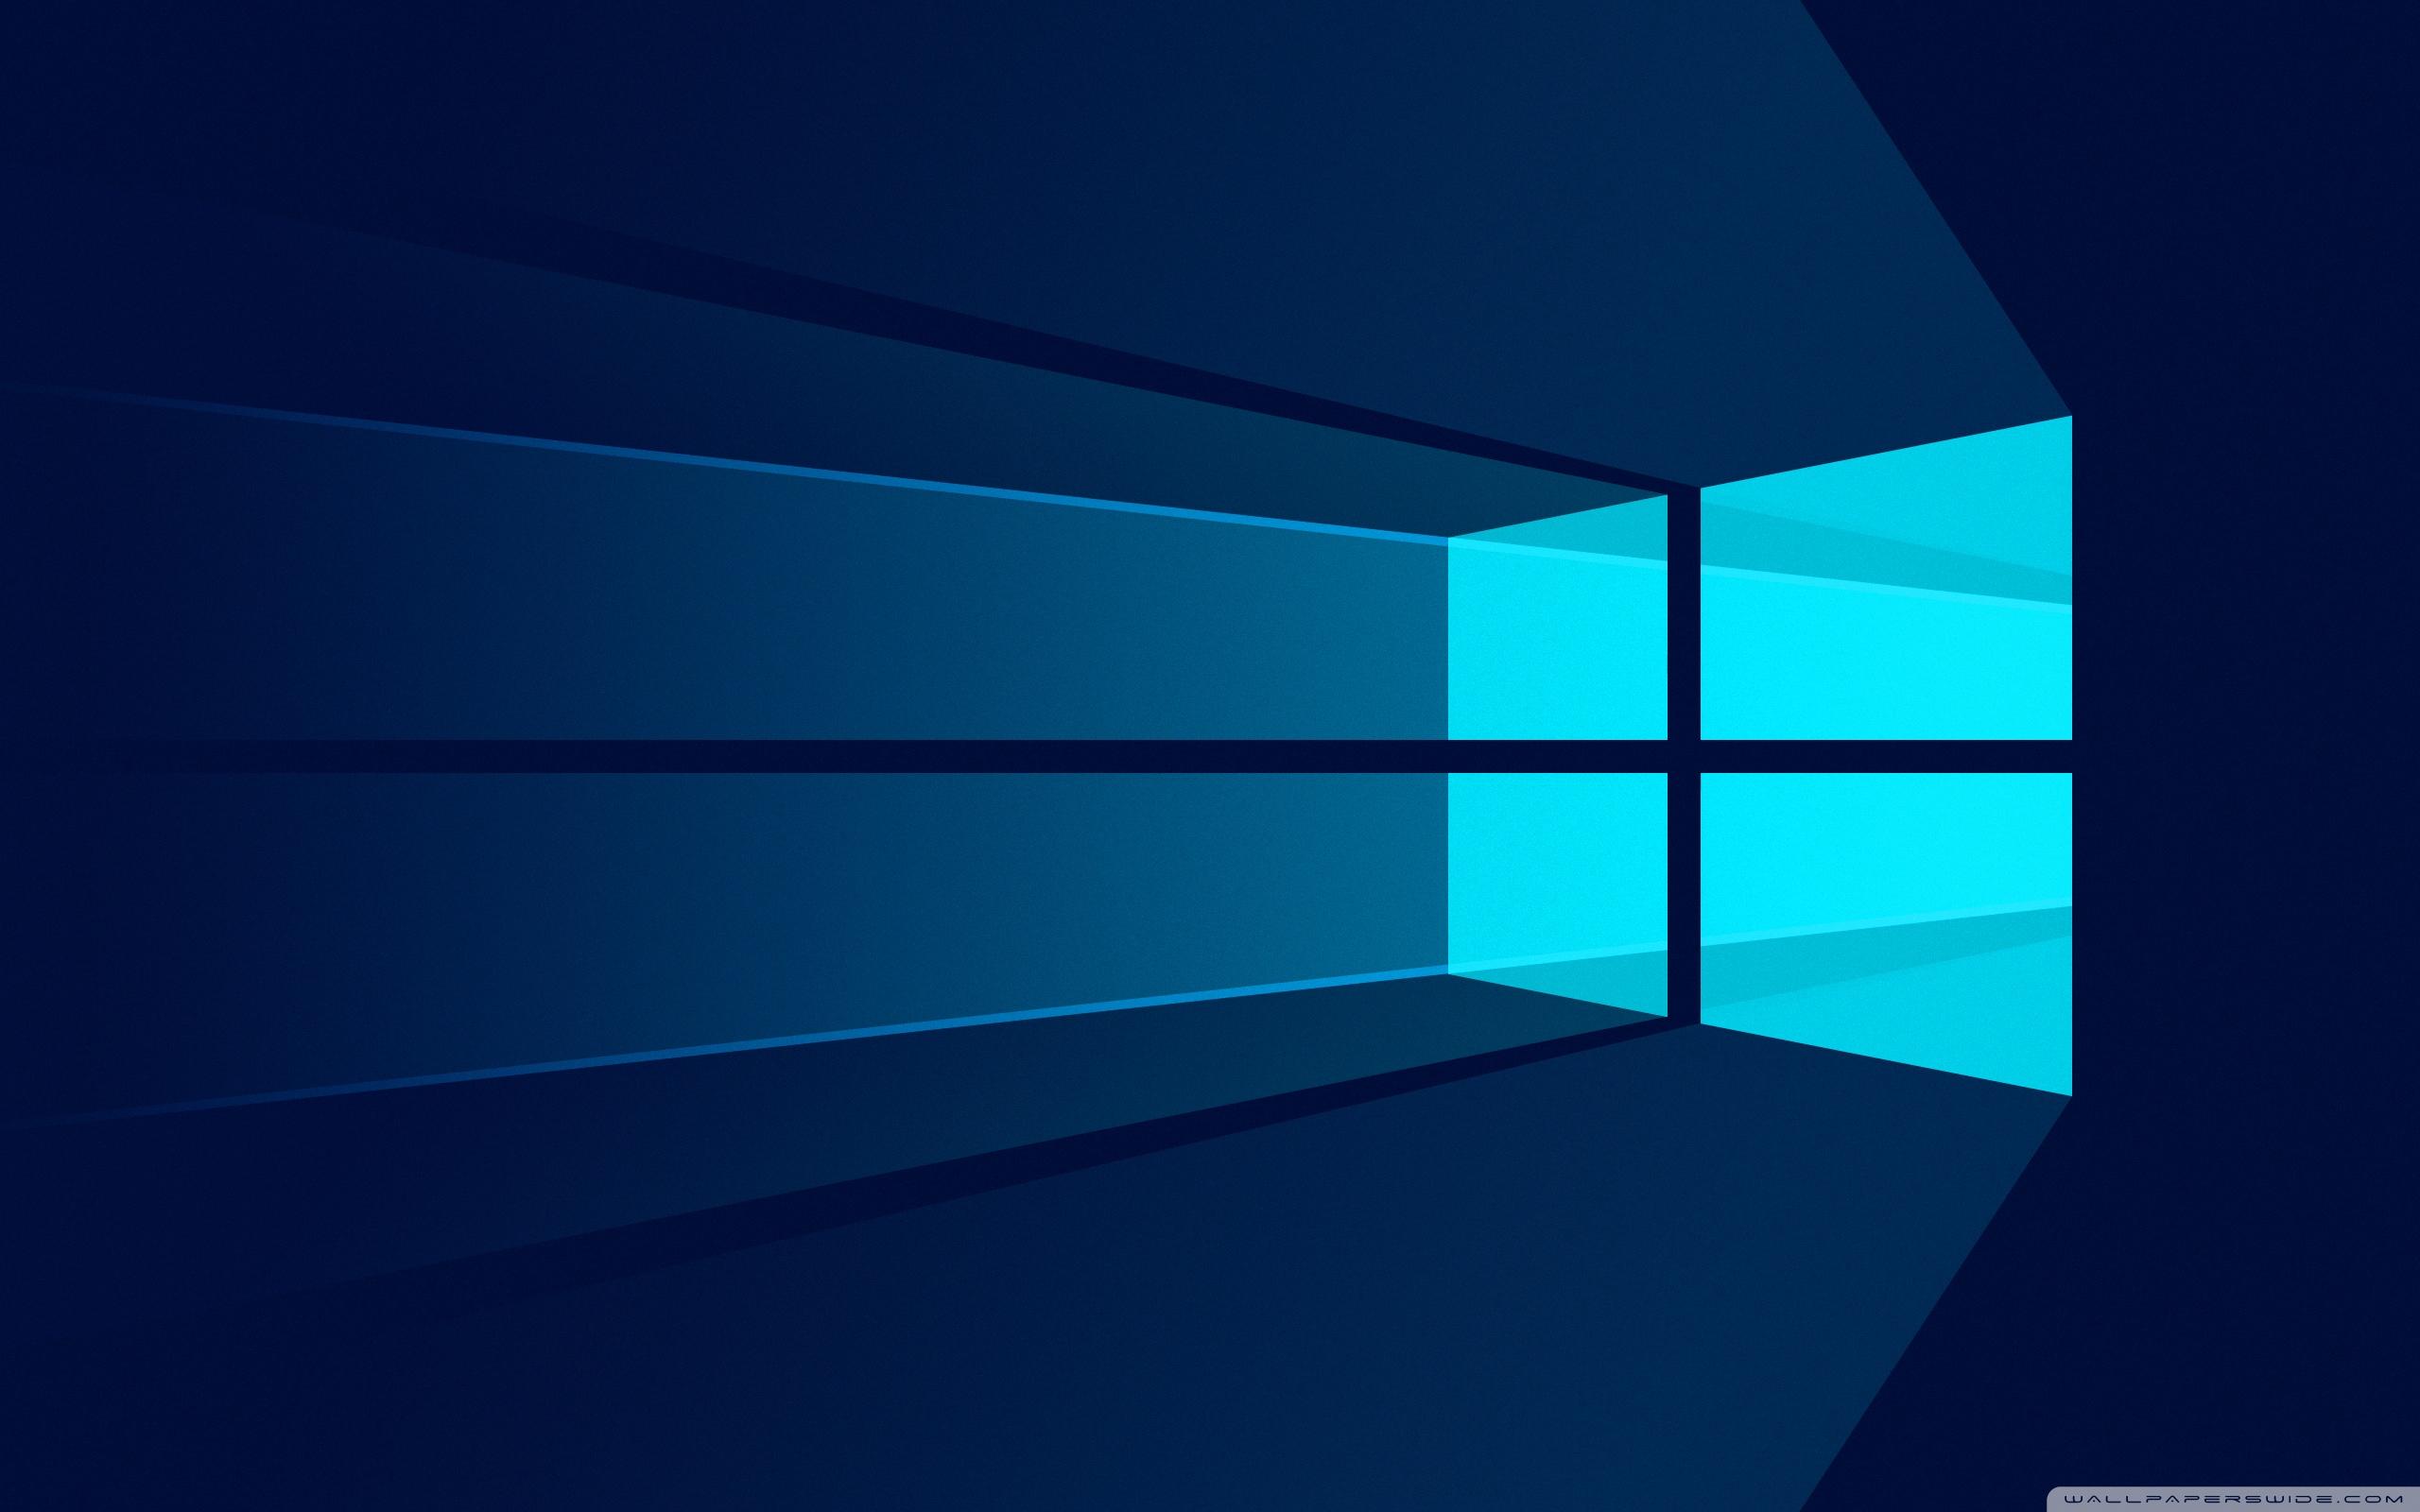 Free Download Wallpaperswidecom Windows 10 Hd Desktop